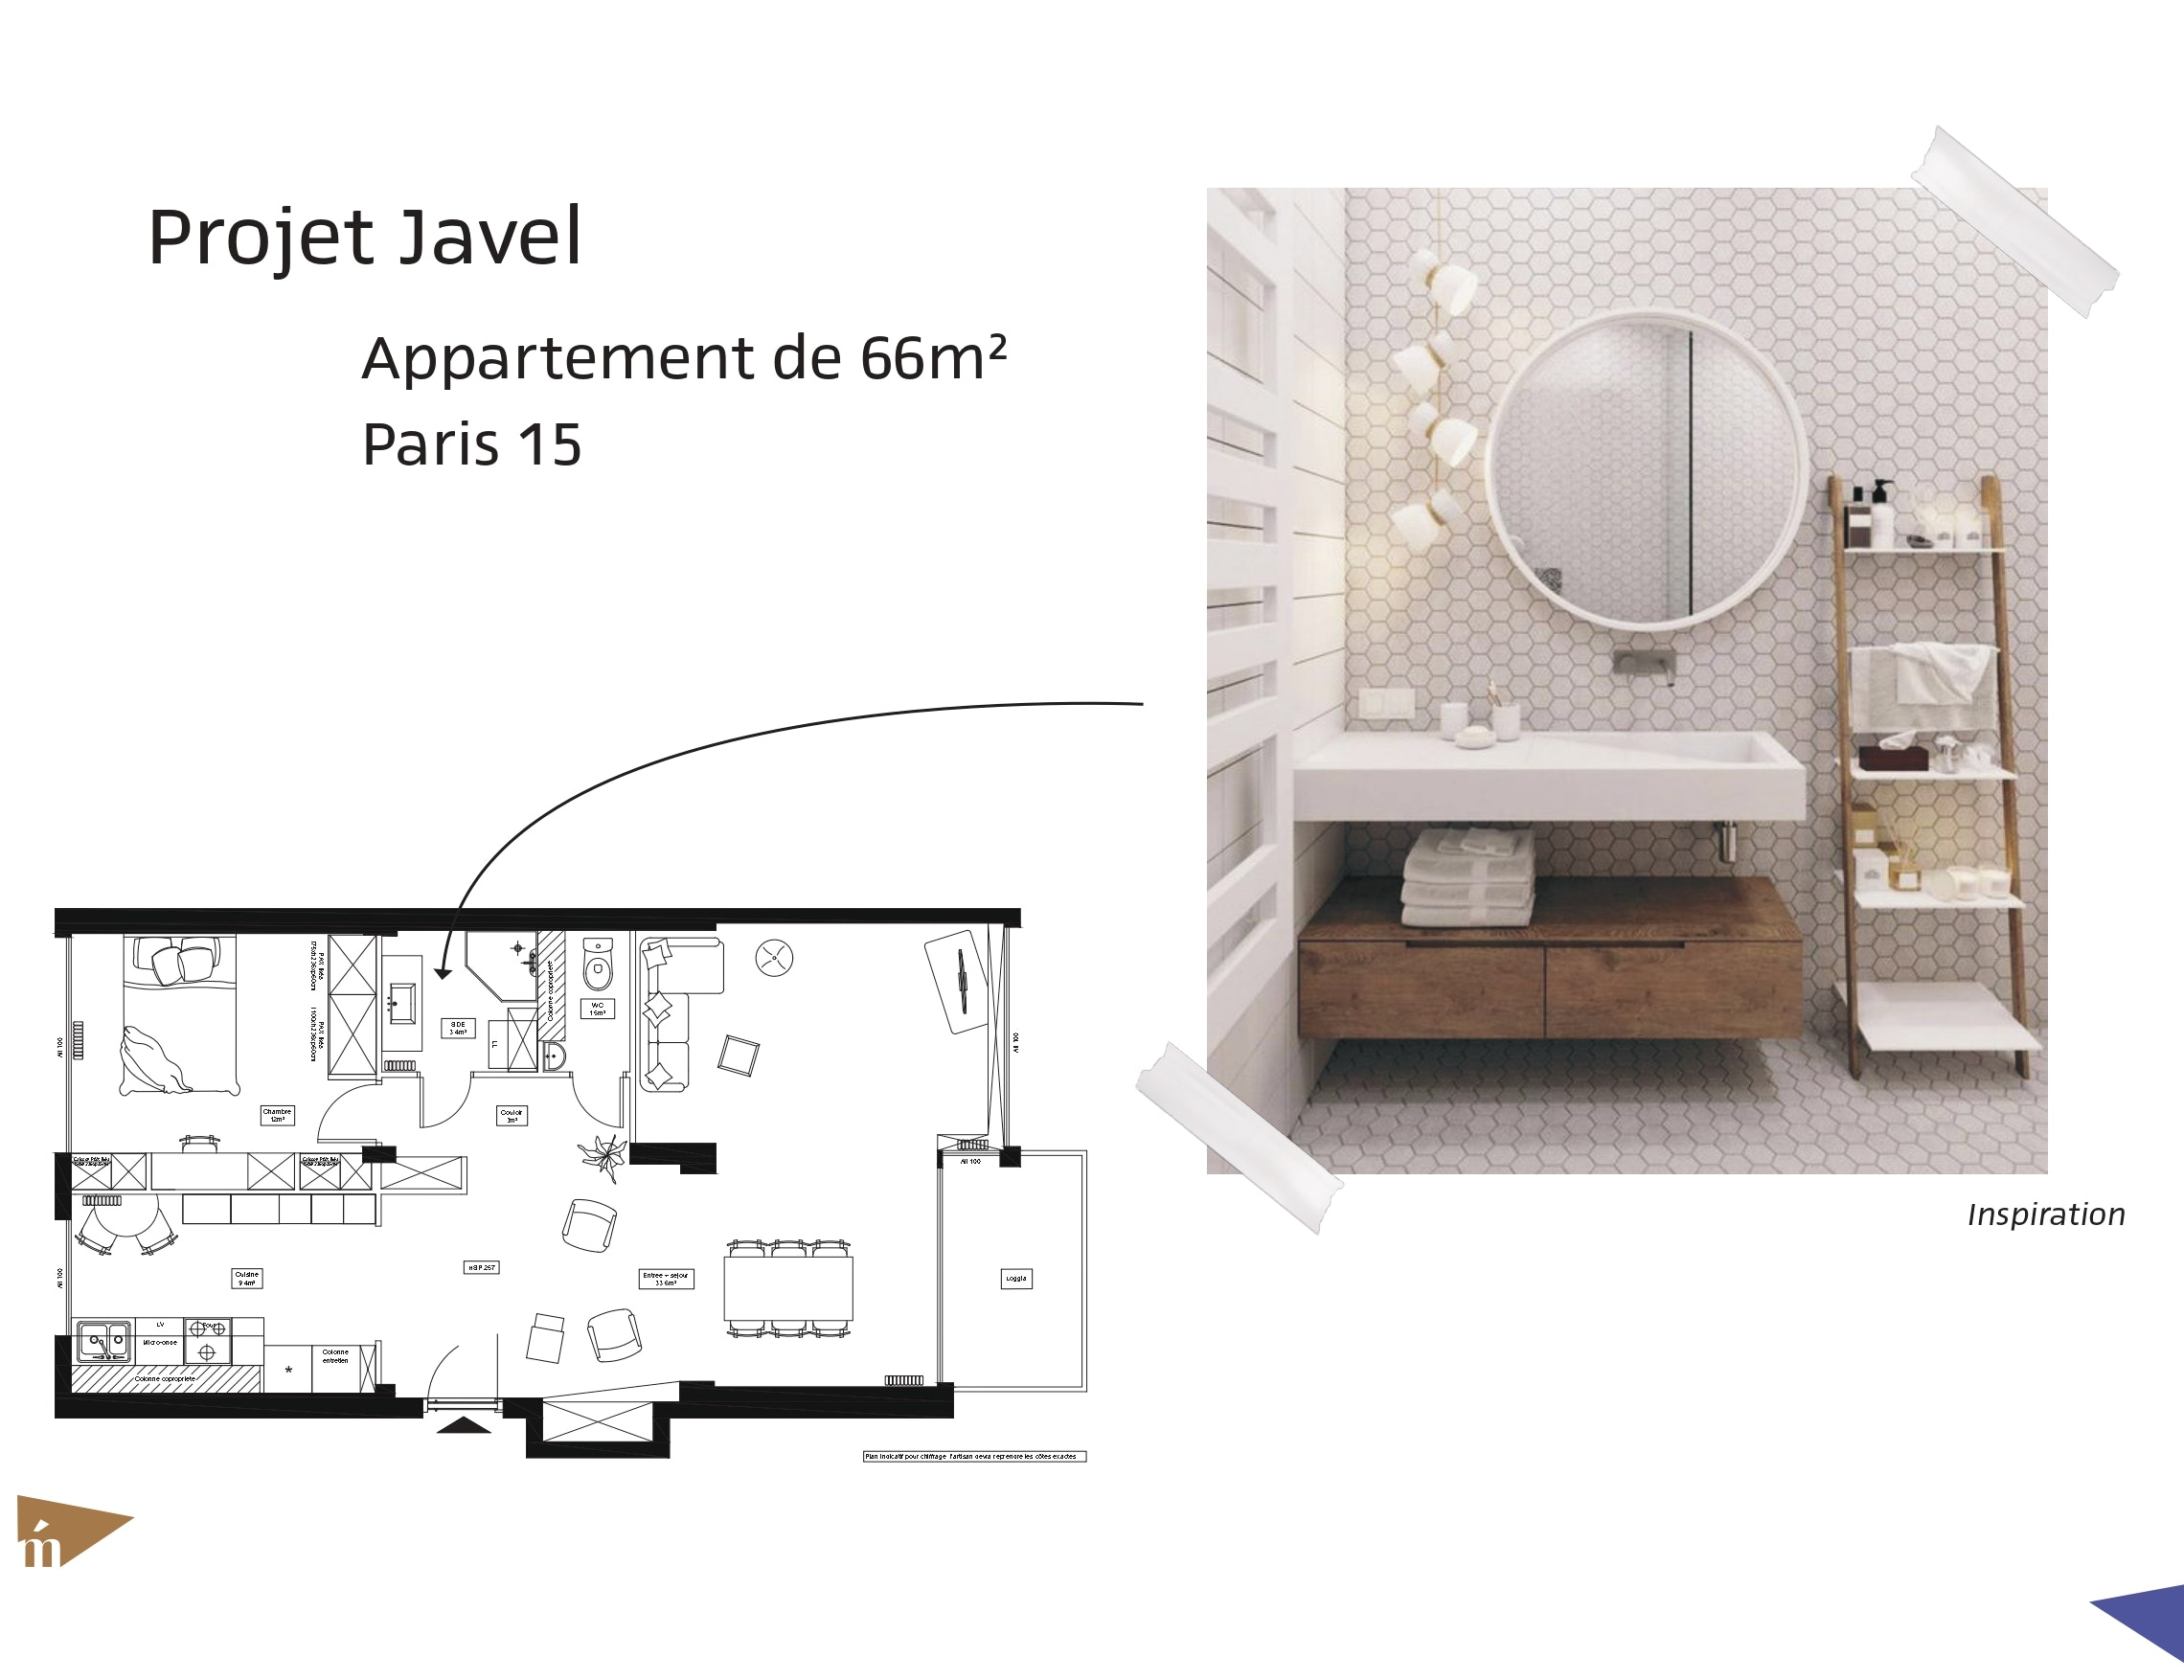 photo Projet Javel - T2 66 m² - Paris 15 Léa Mast - Architecte hemea